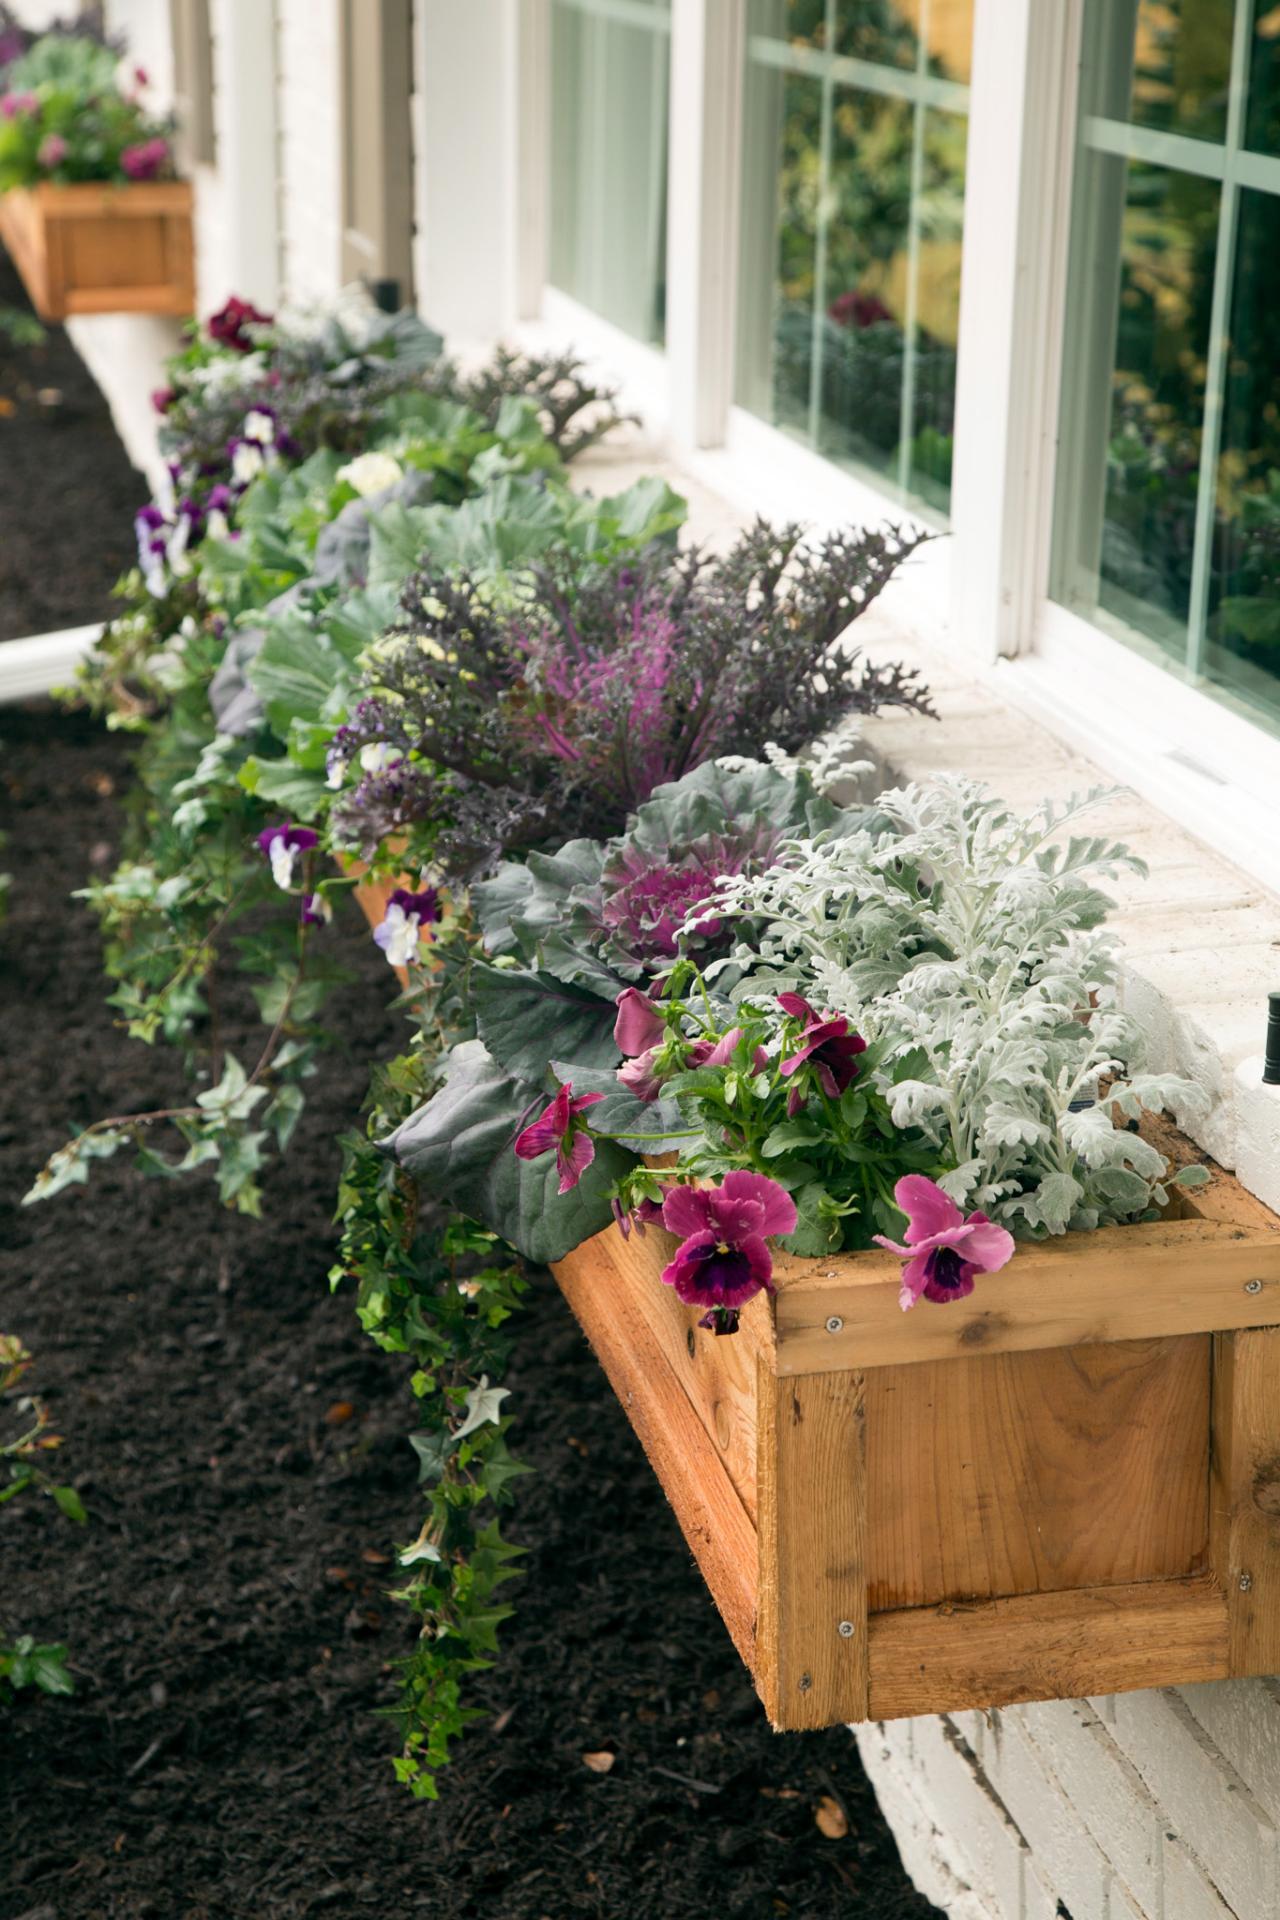 23 Dreamy Cottage Gardens HGTV s Decorating & Design Blog